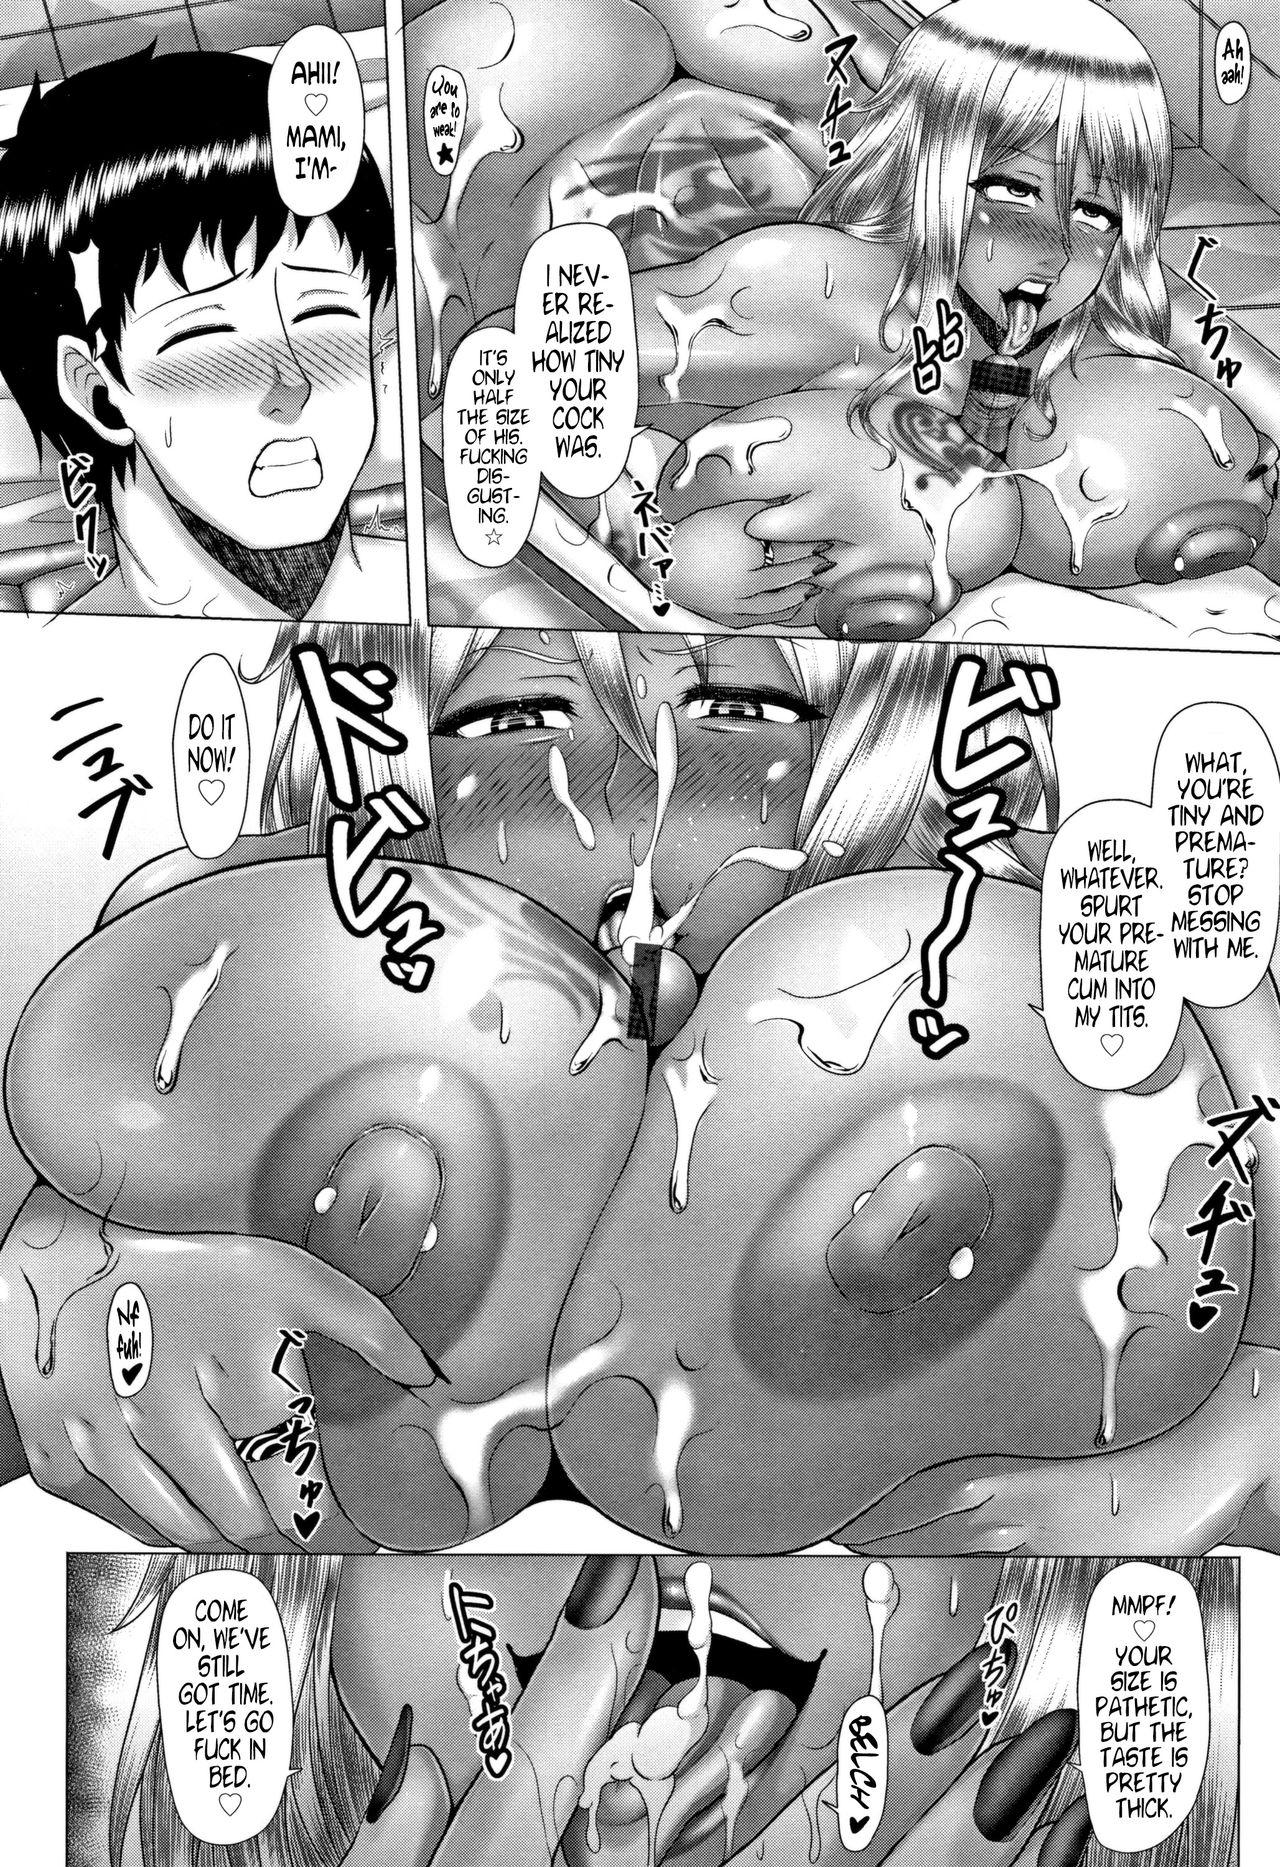 [Inoue Nanaki] Joushiki Daha! Kuro Gal Bitch-ka Seikatsu Ch. 1-3, 5-8 [English] [Dark Mac + N04h] 111